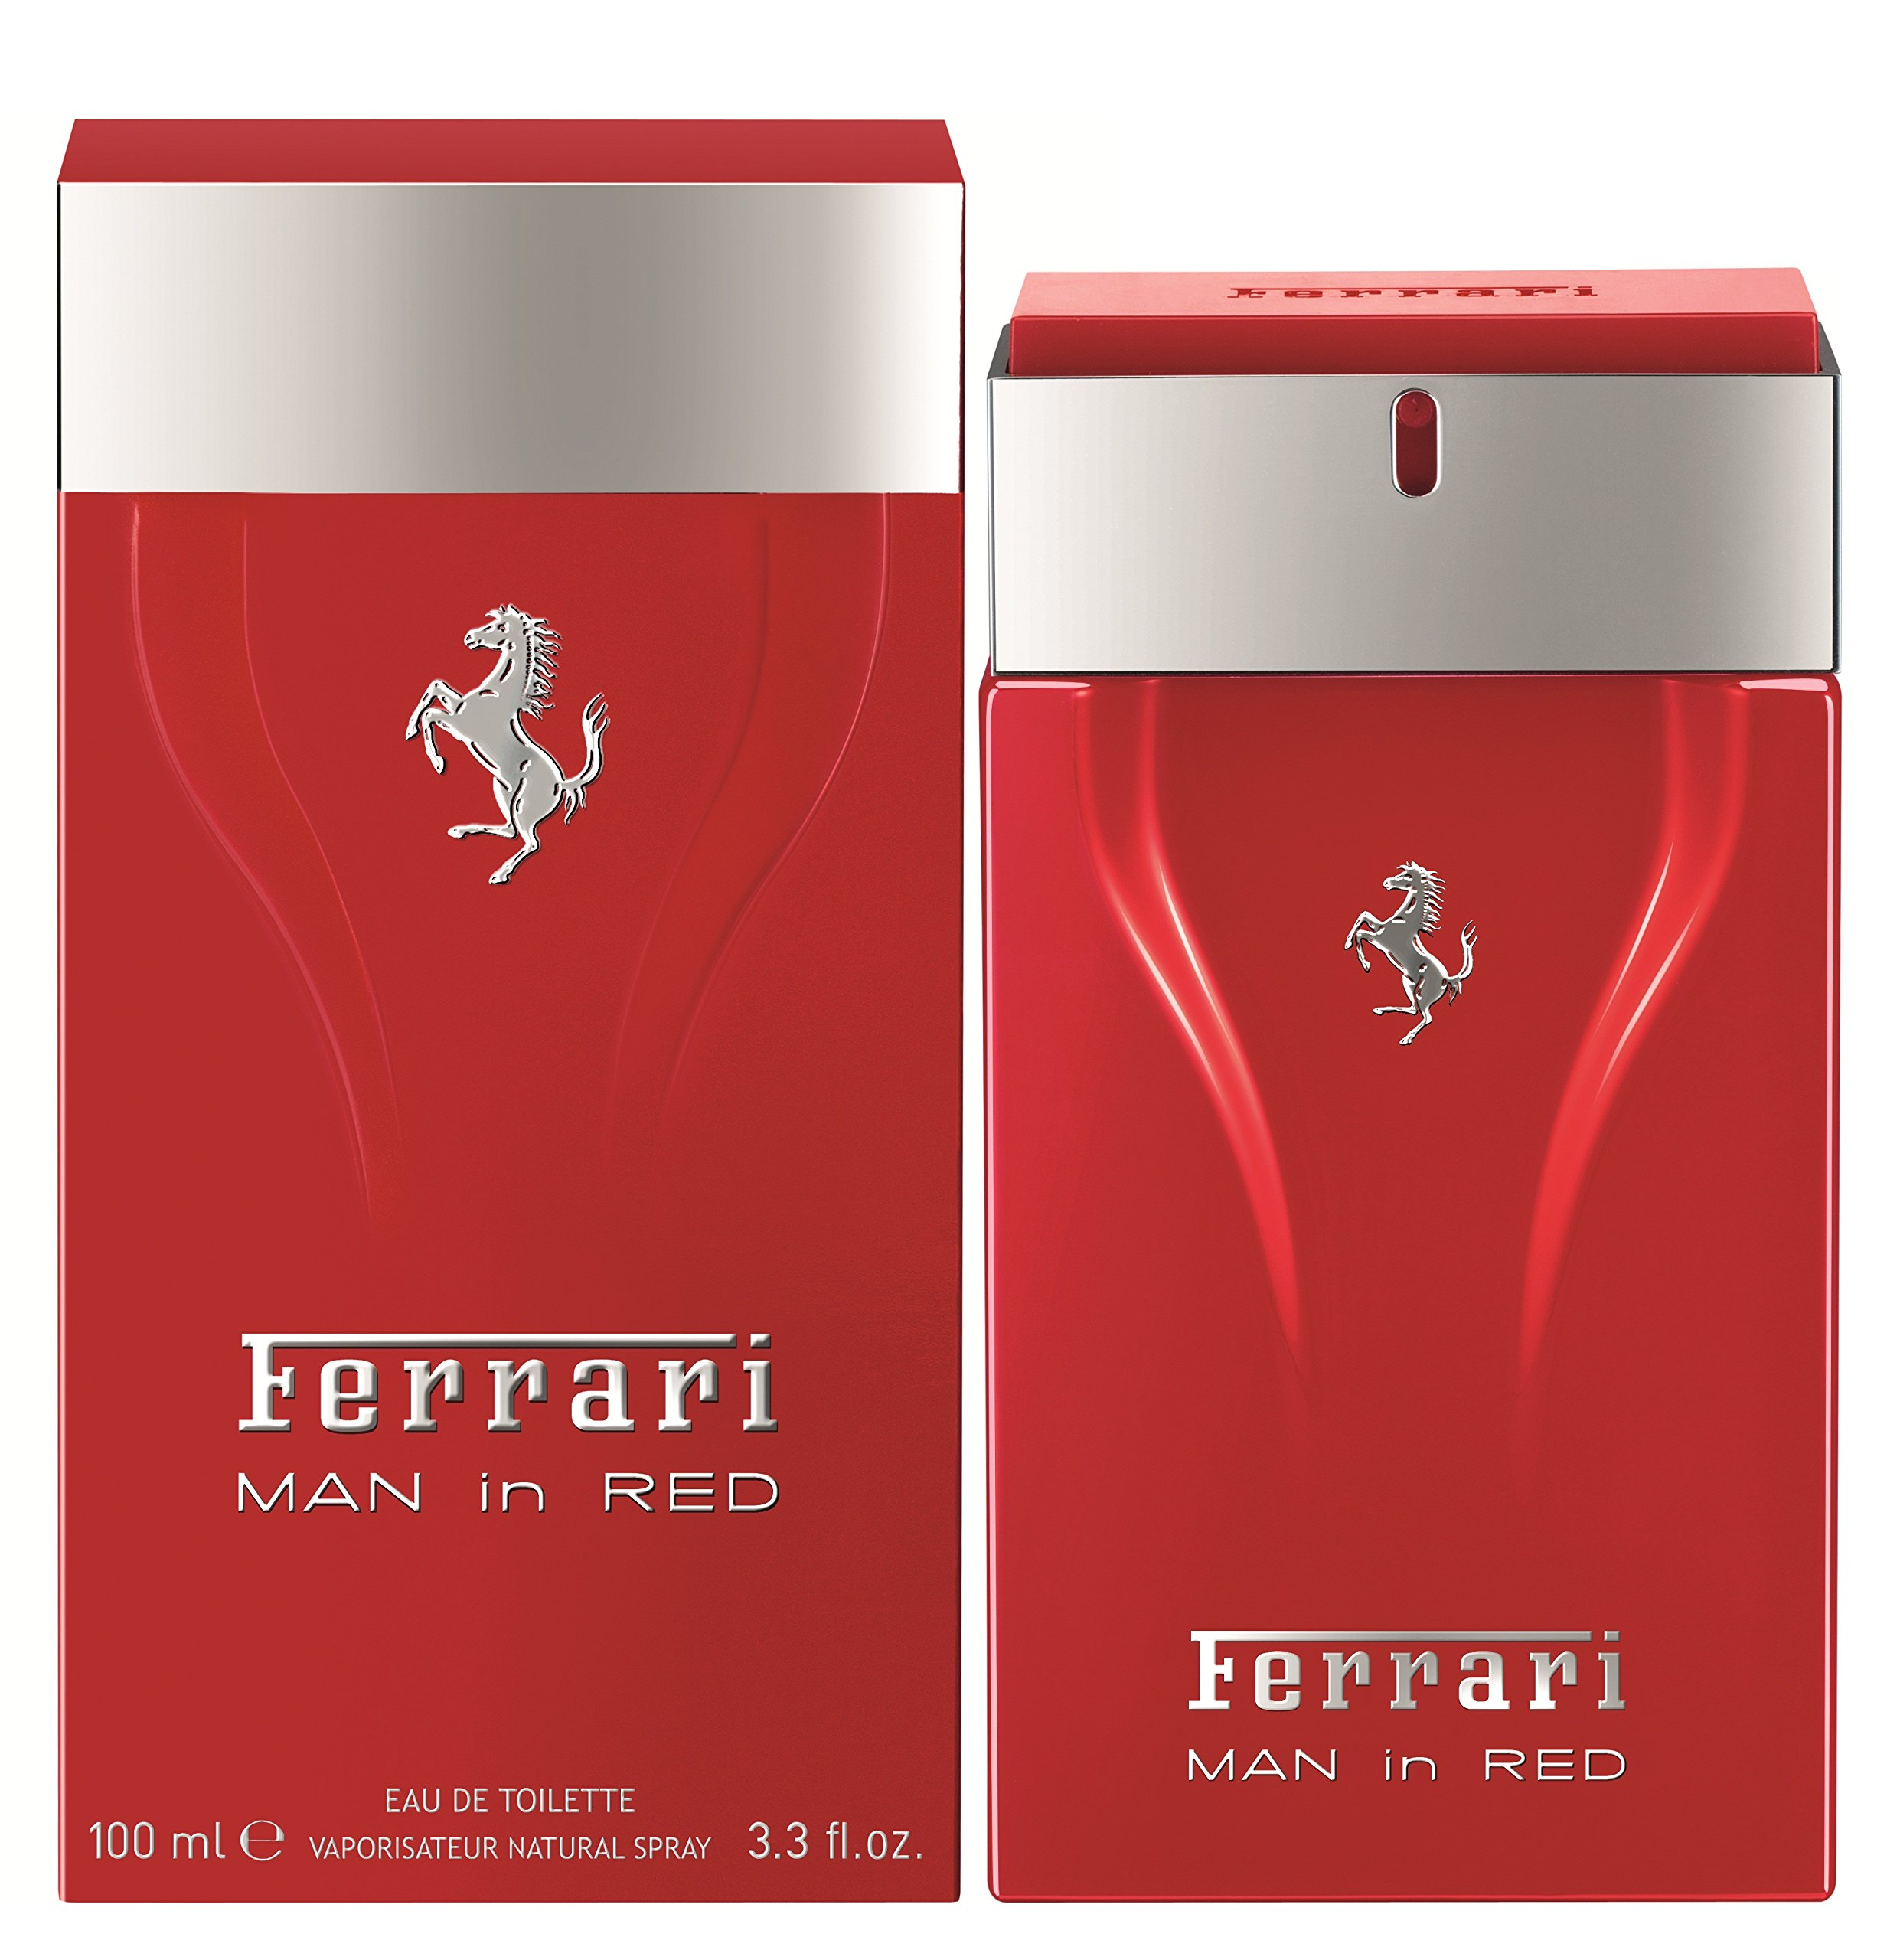 Ferrari Toilette Spray 100ml 3 3oz